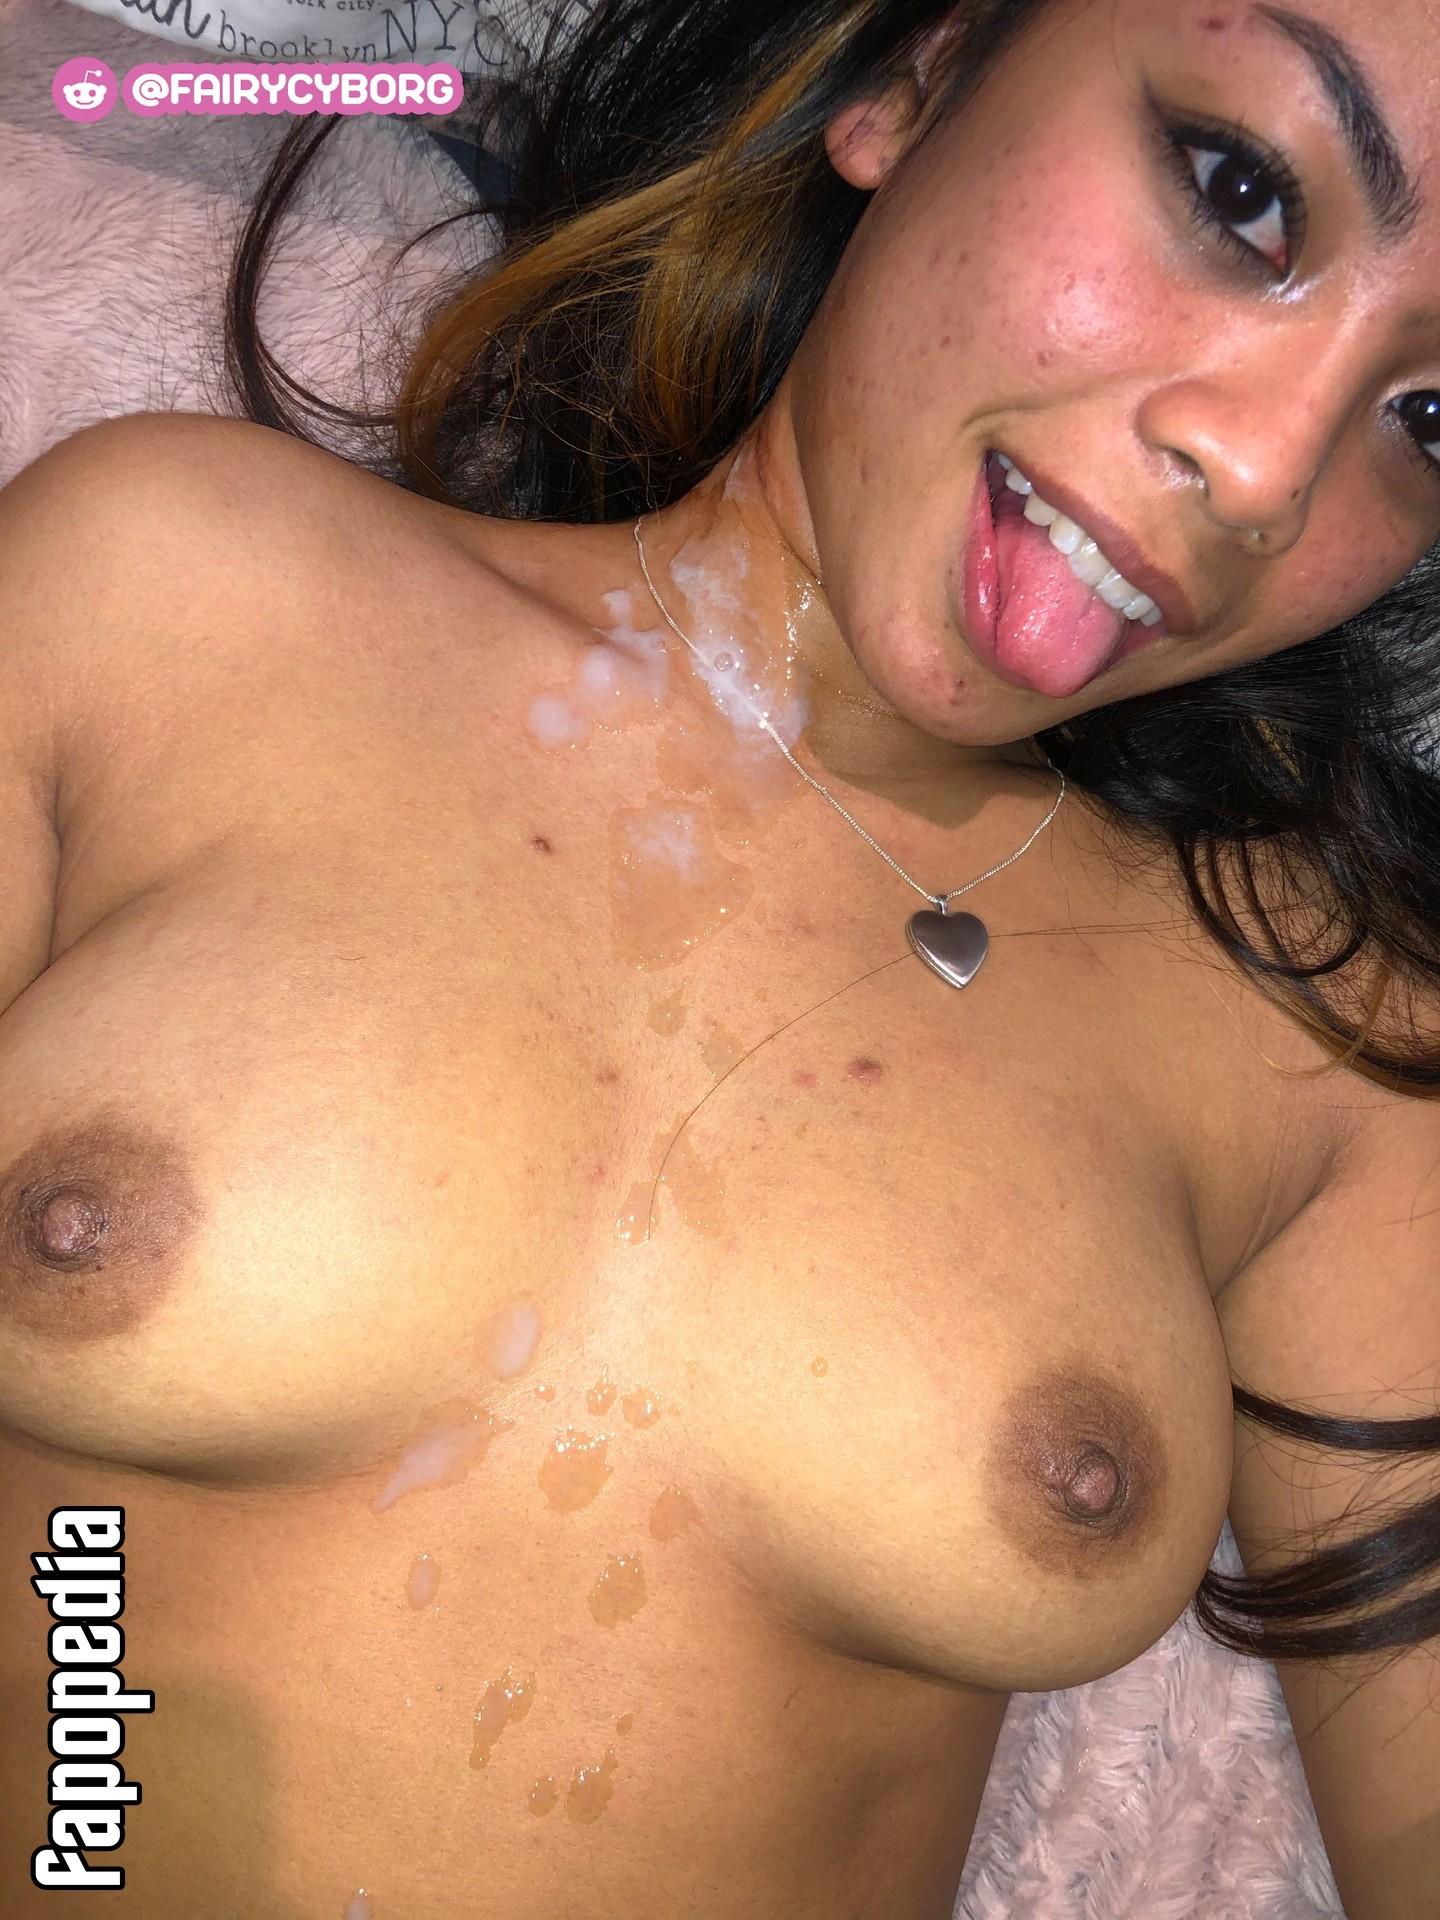 Fairycyborg Nude Leaks